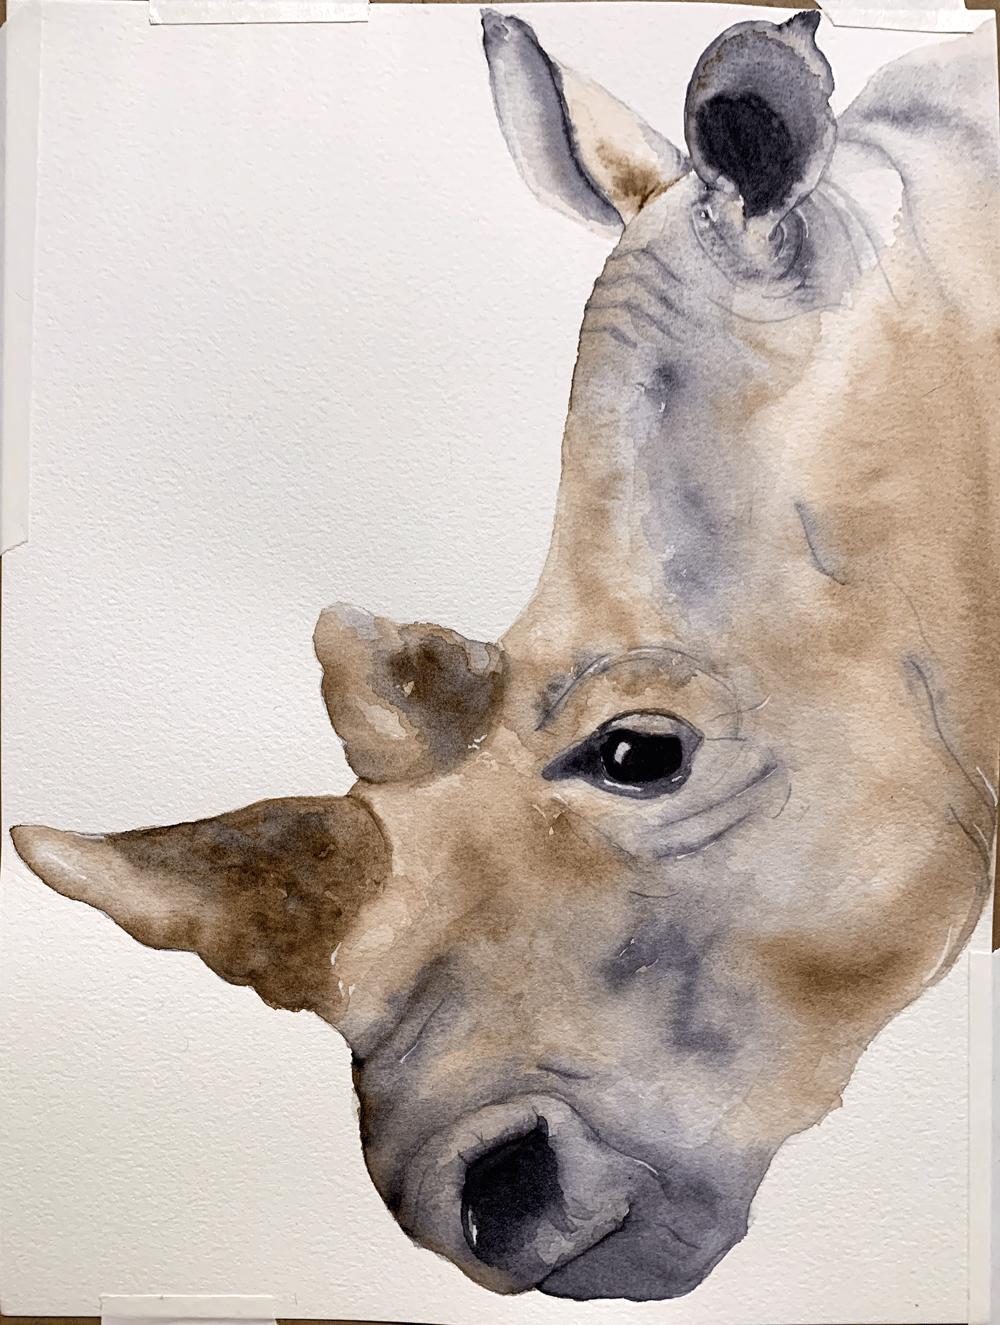 White Rhino - image 1 - student project